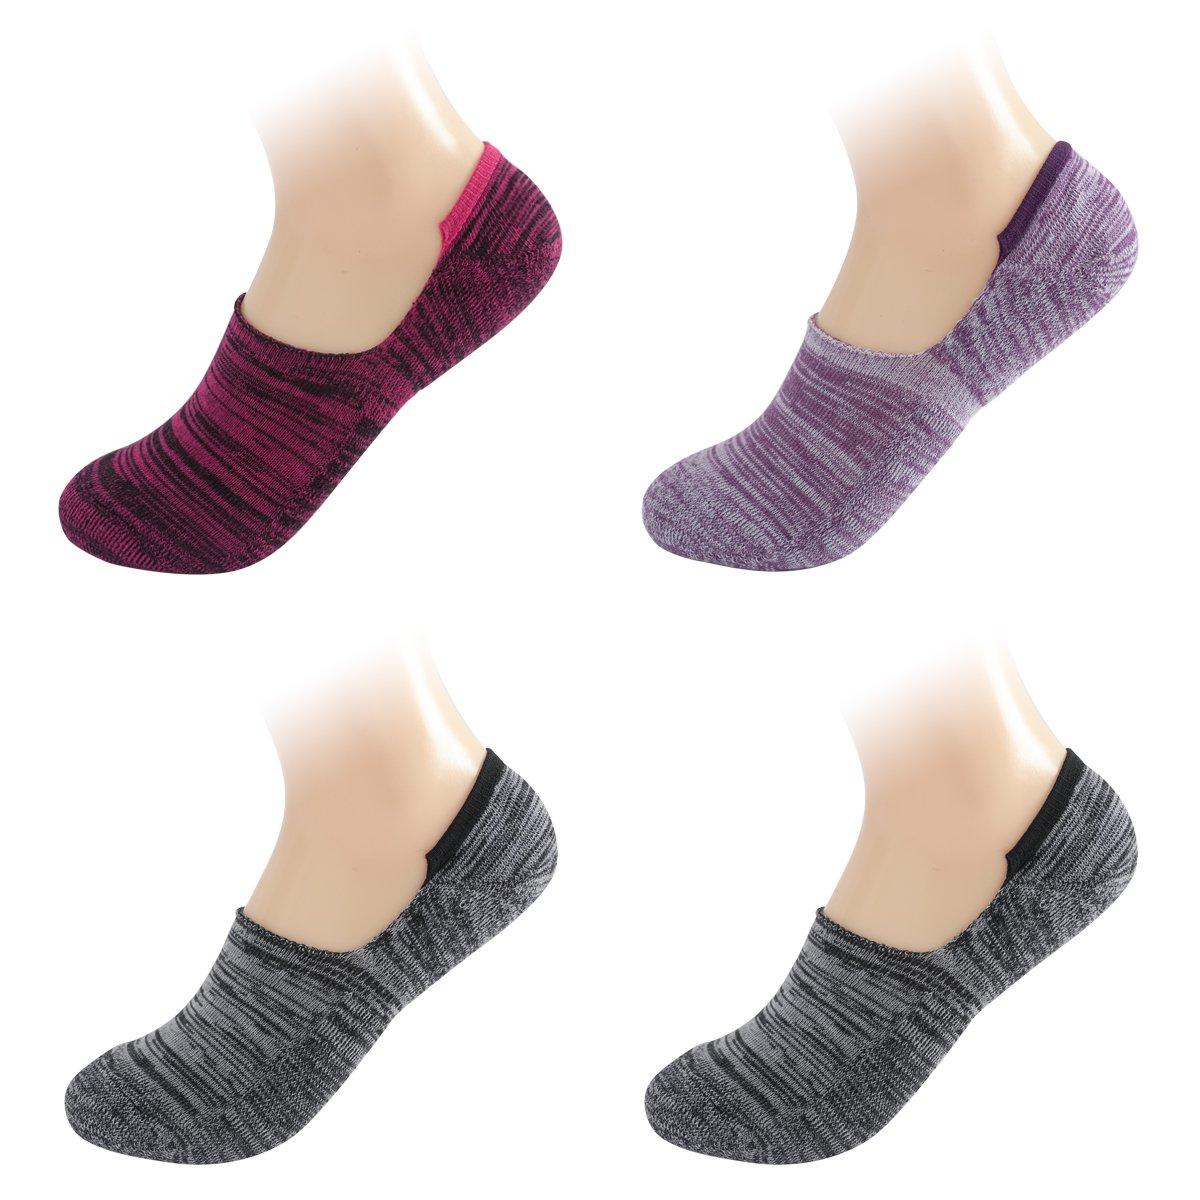 Keewen Women's Low Cut No Show Cushion Sport Running Liner Socks, Non-Slip. (4pp) CWL019CC